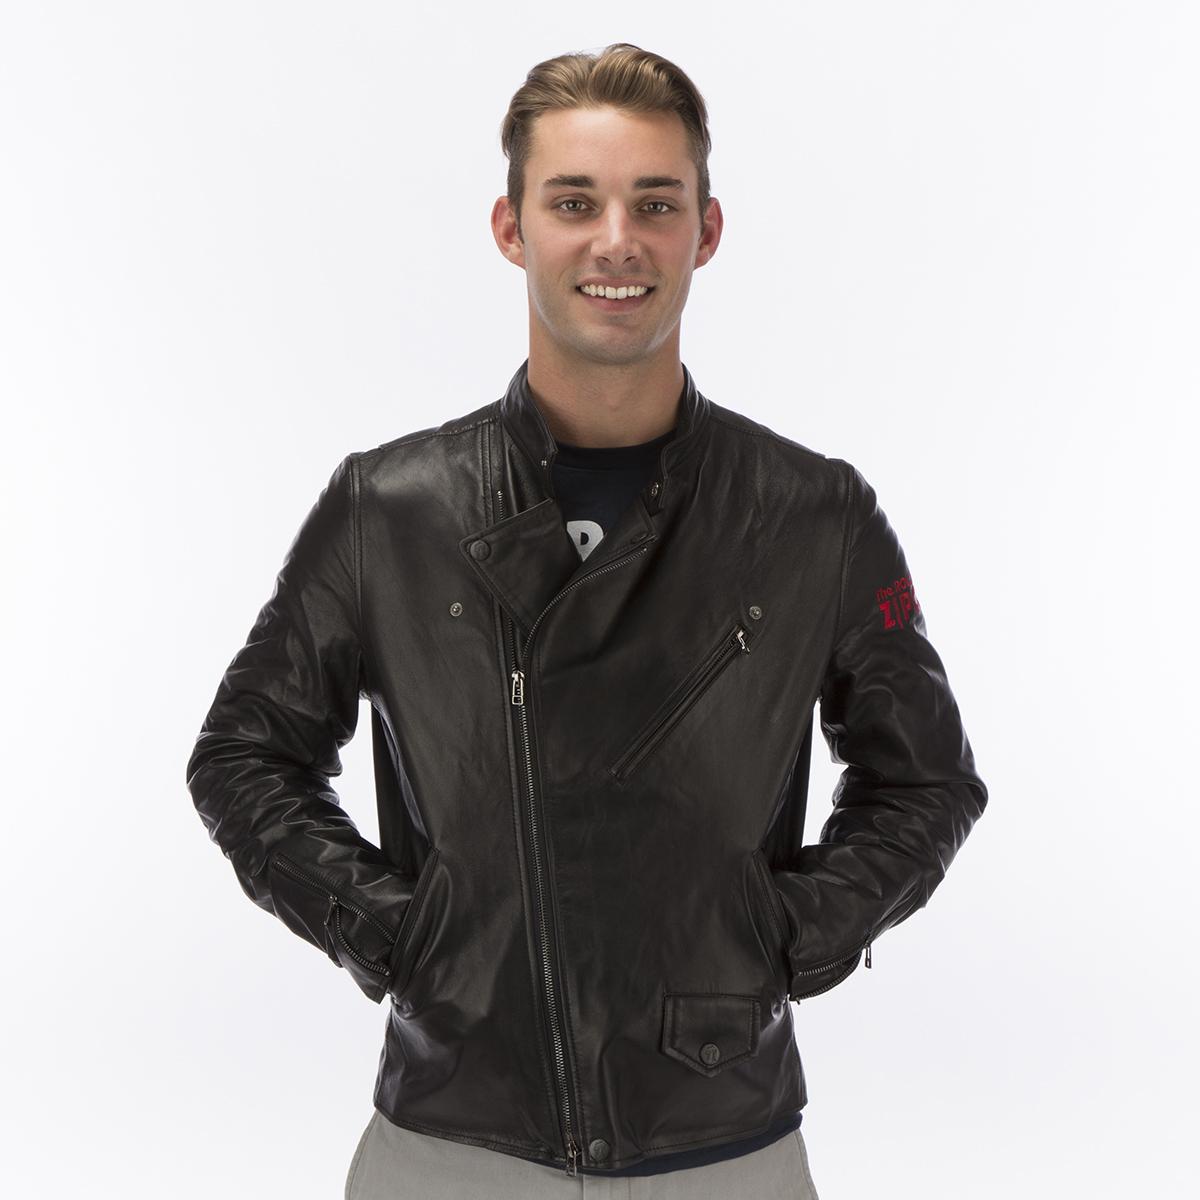 Rolling stones leather jacket